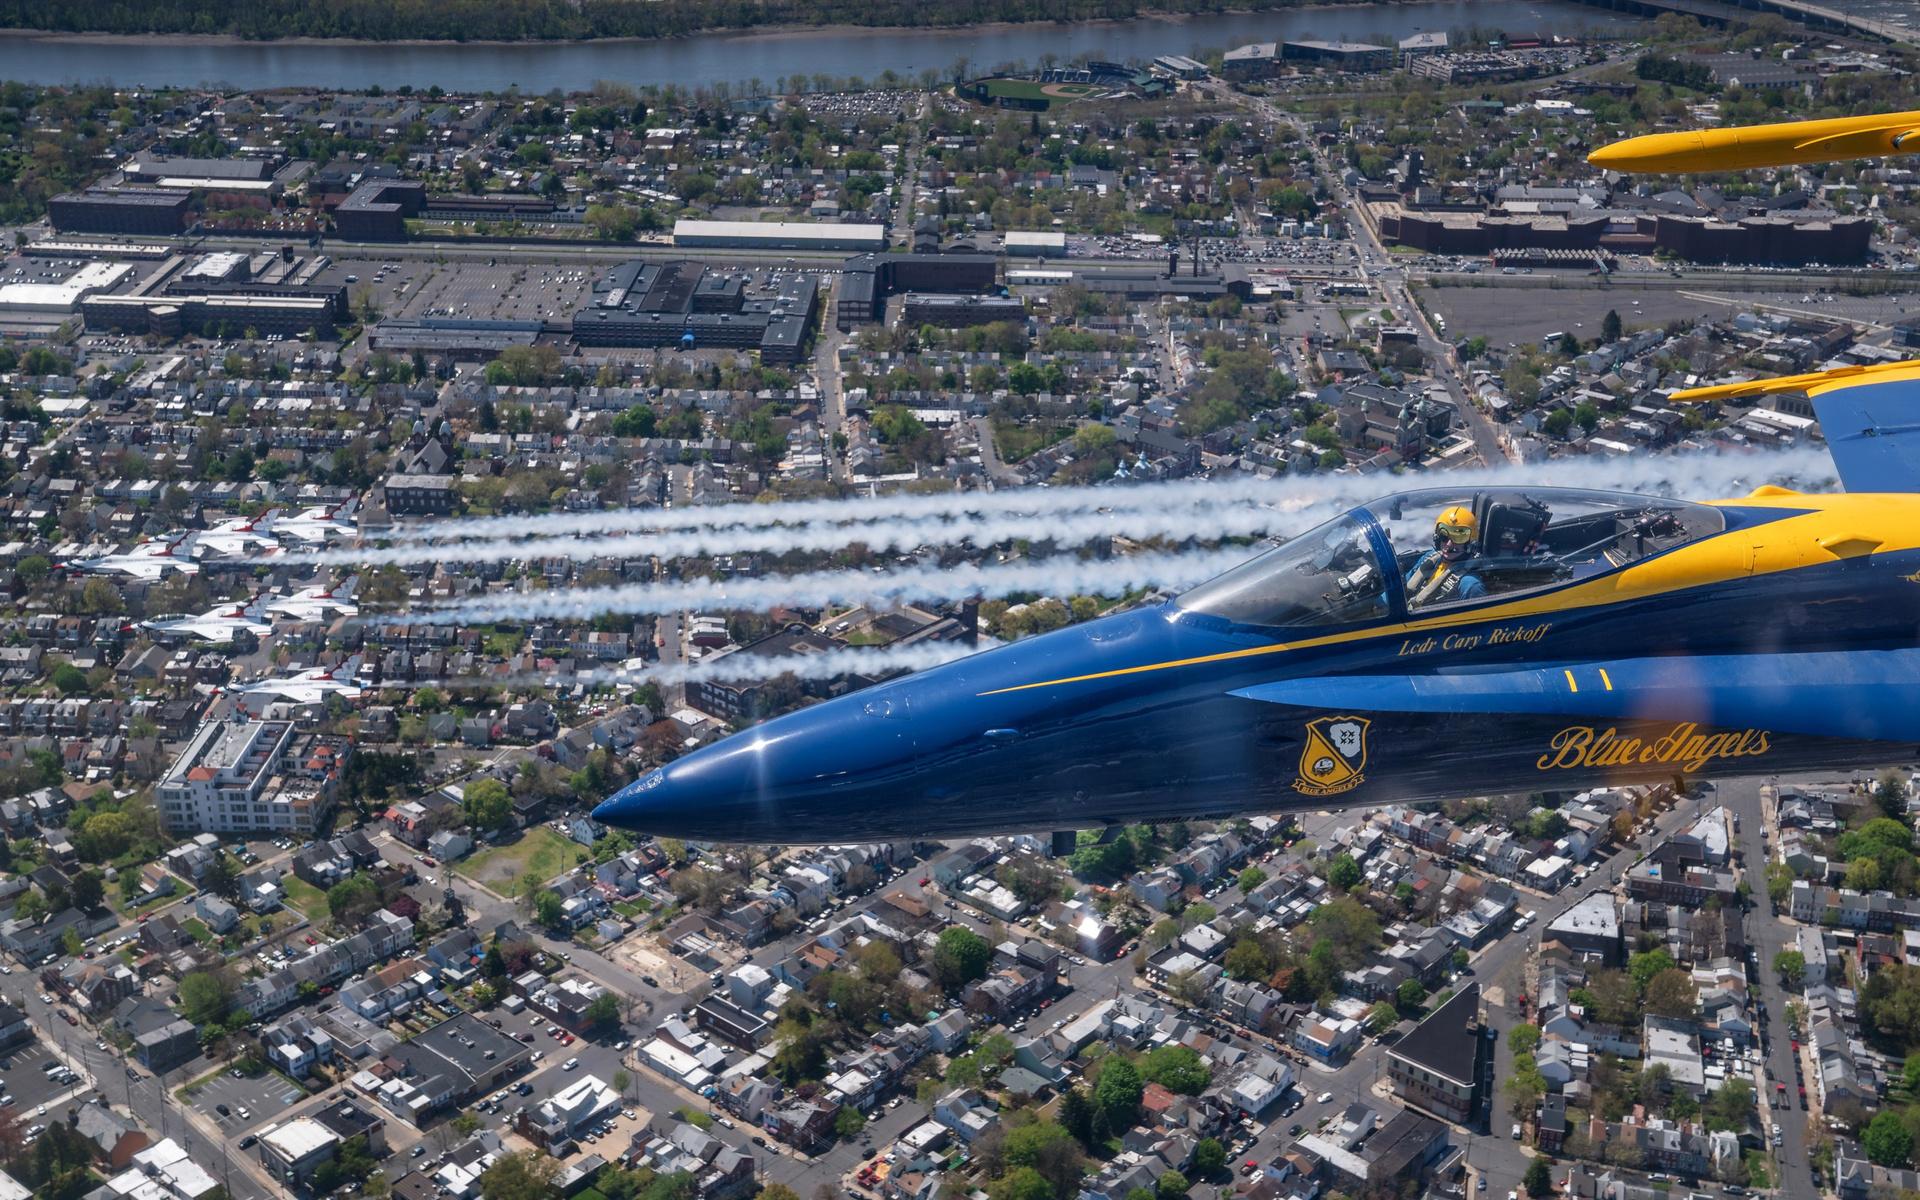 blue angels, mcdonnell douglas fa-18 hornet, flight demonstration squadron, united states navy, fa-18